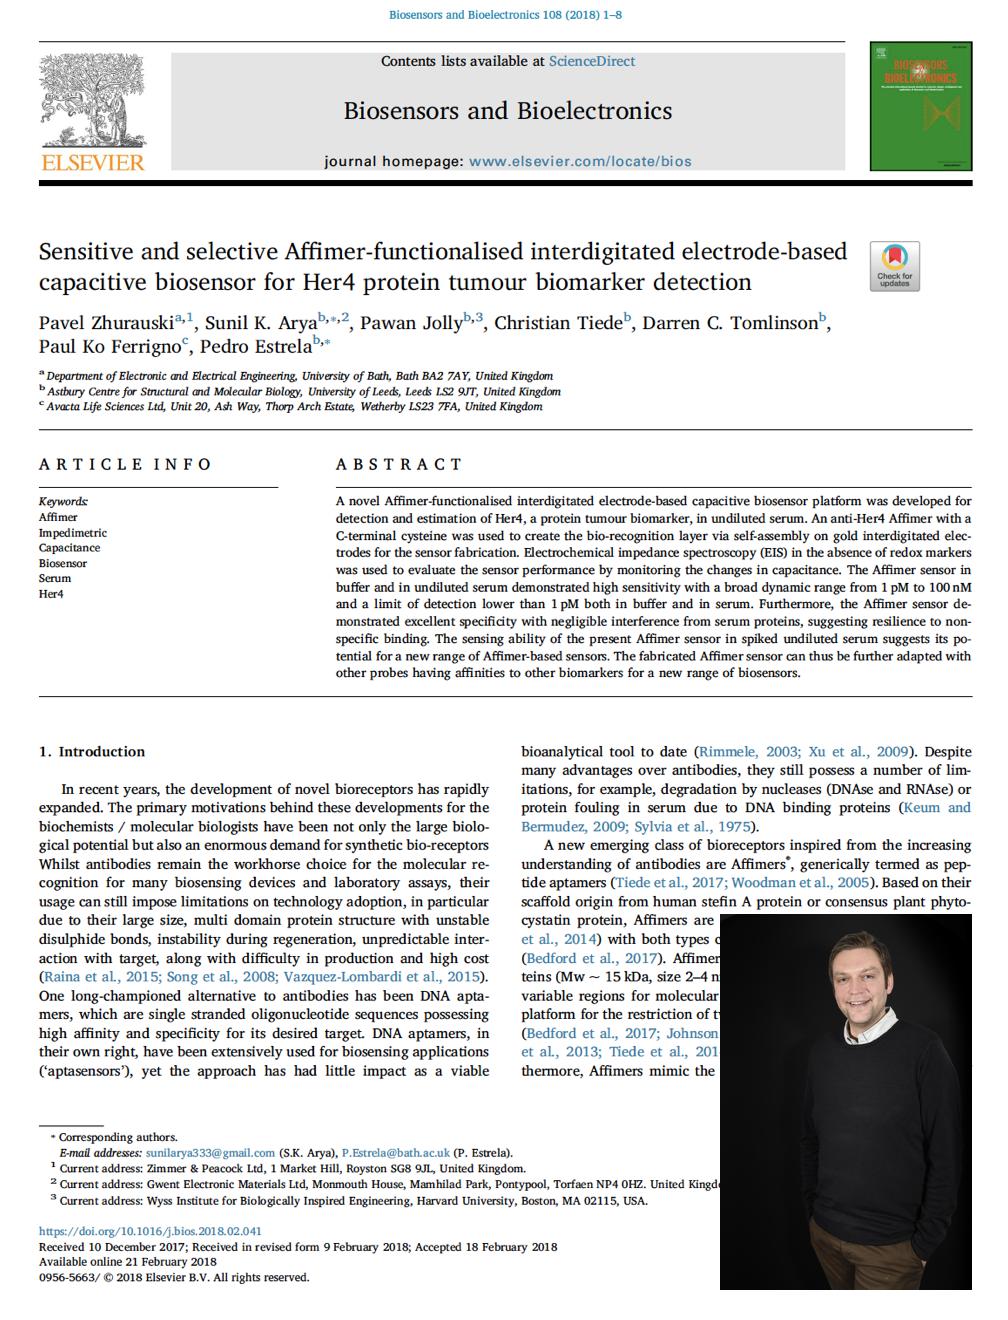 Zimmer and Peacock Ltd team member publication in Biosensors